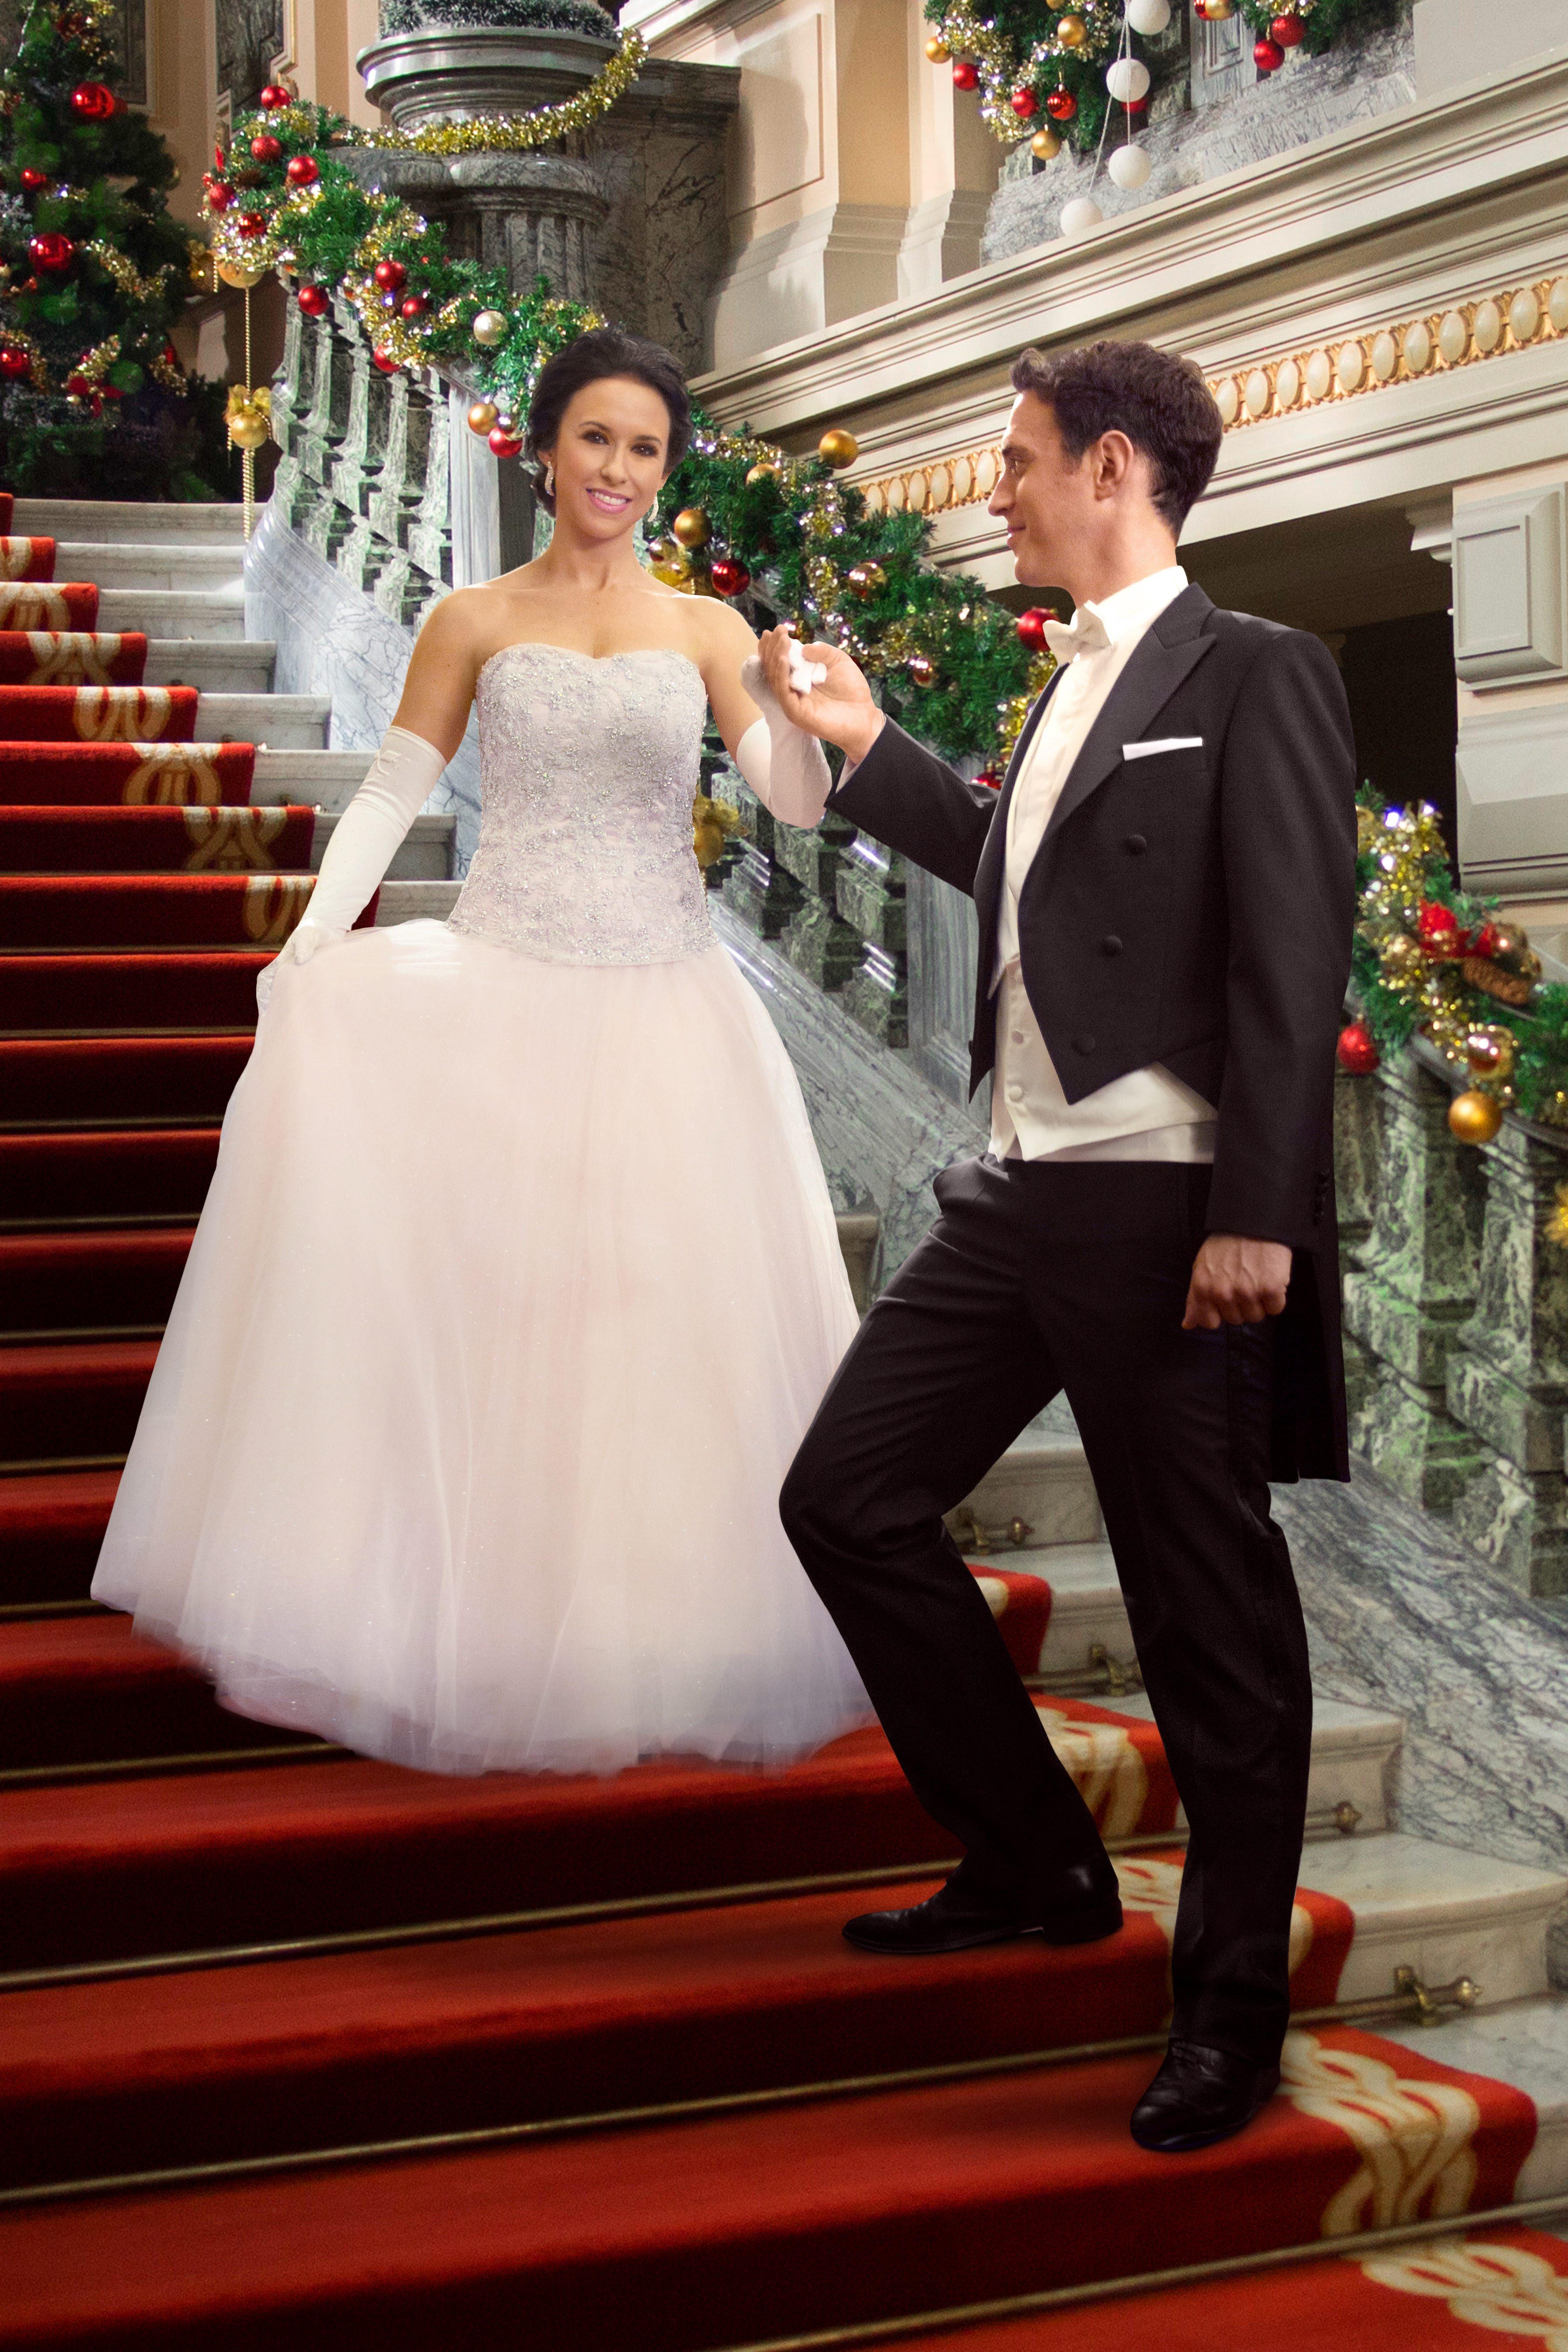 A Royal Christmas' takes fantasy too far - Washington Times